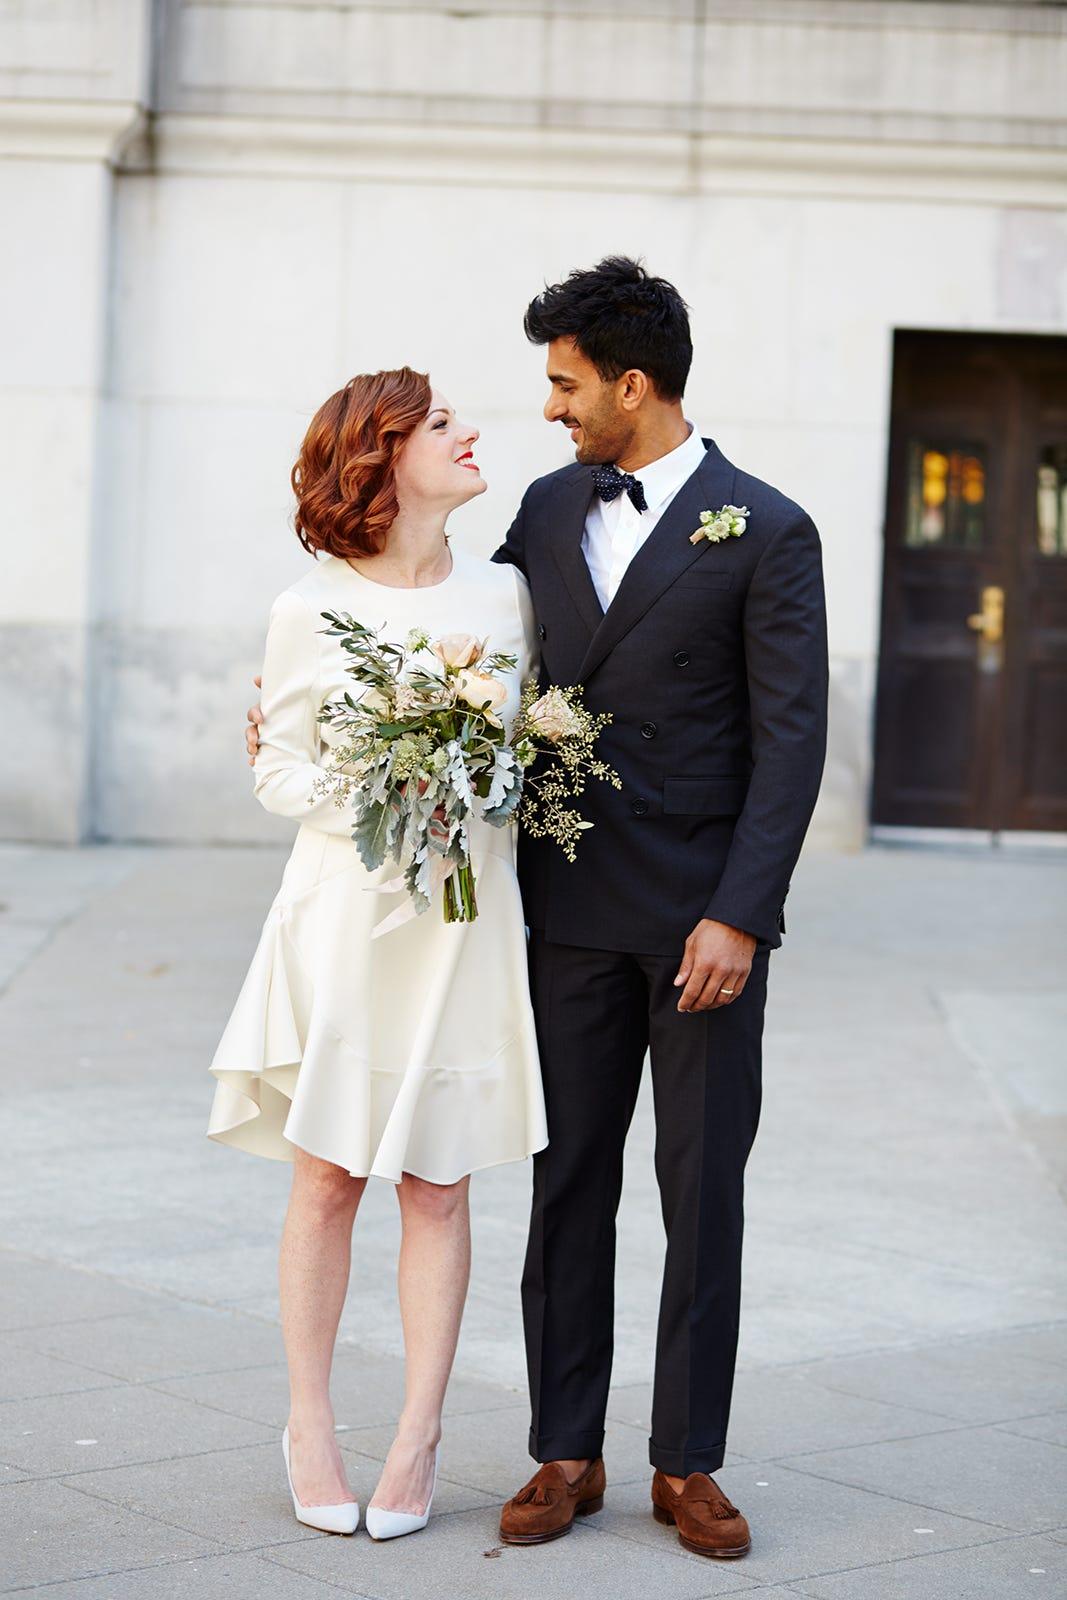 Wedding Attire Knot